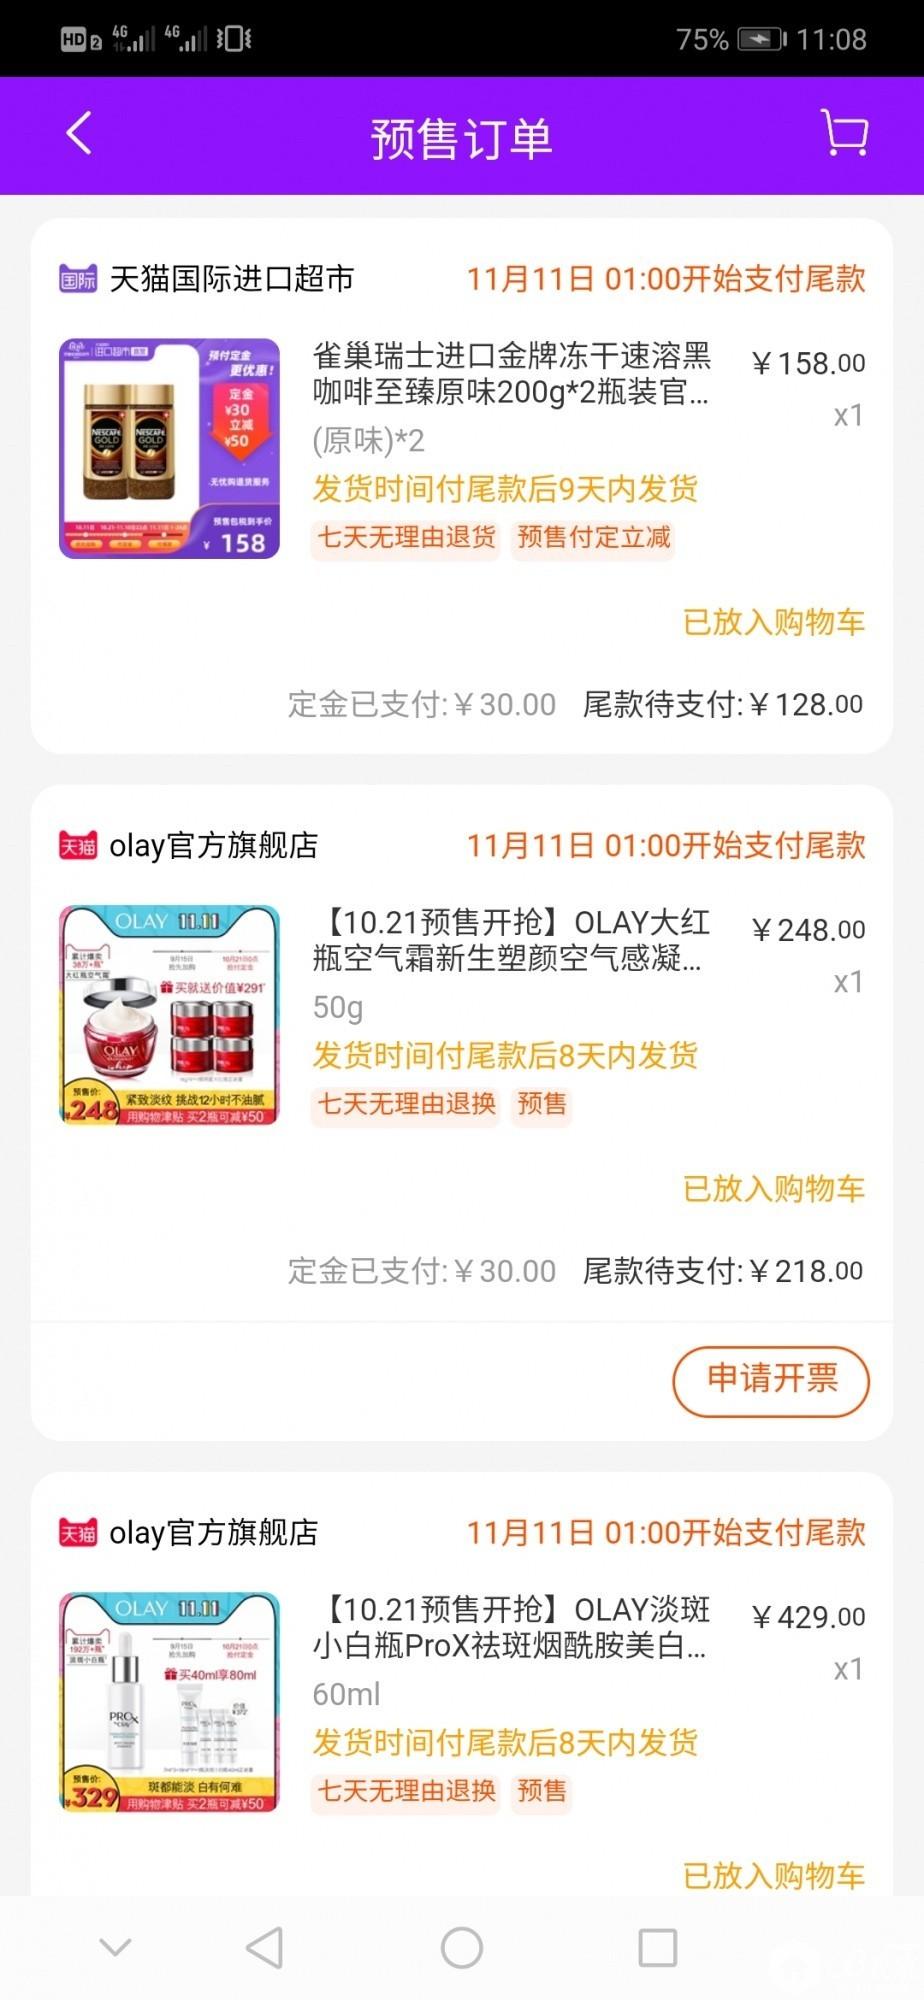 Screenshot_20191031_230816_com.taobao.taobao.jpg